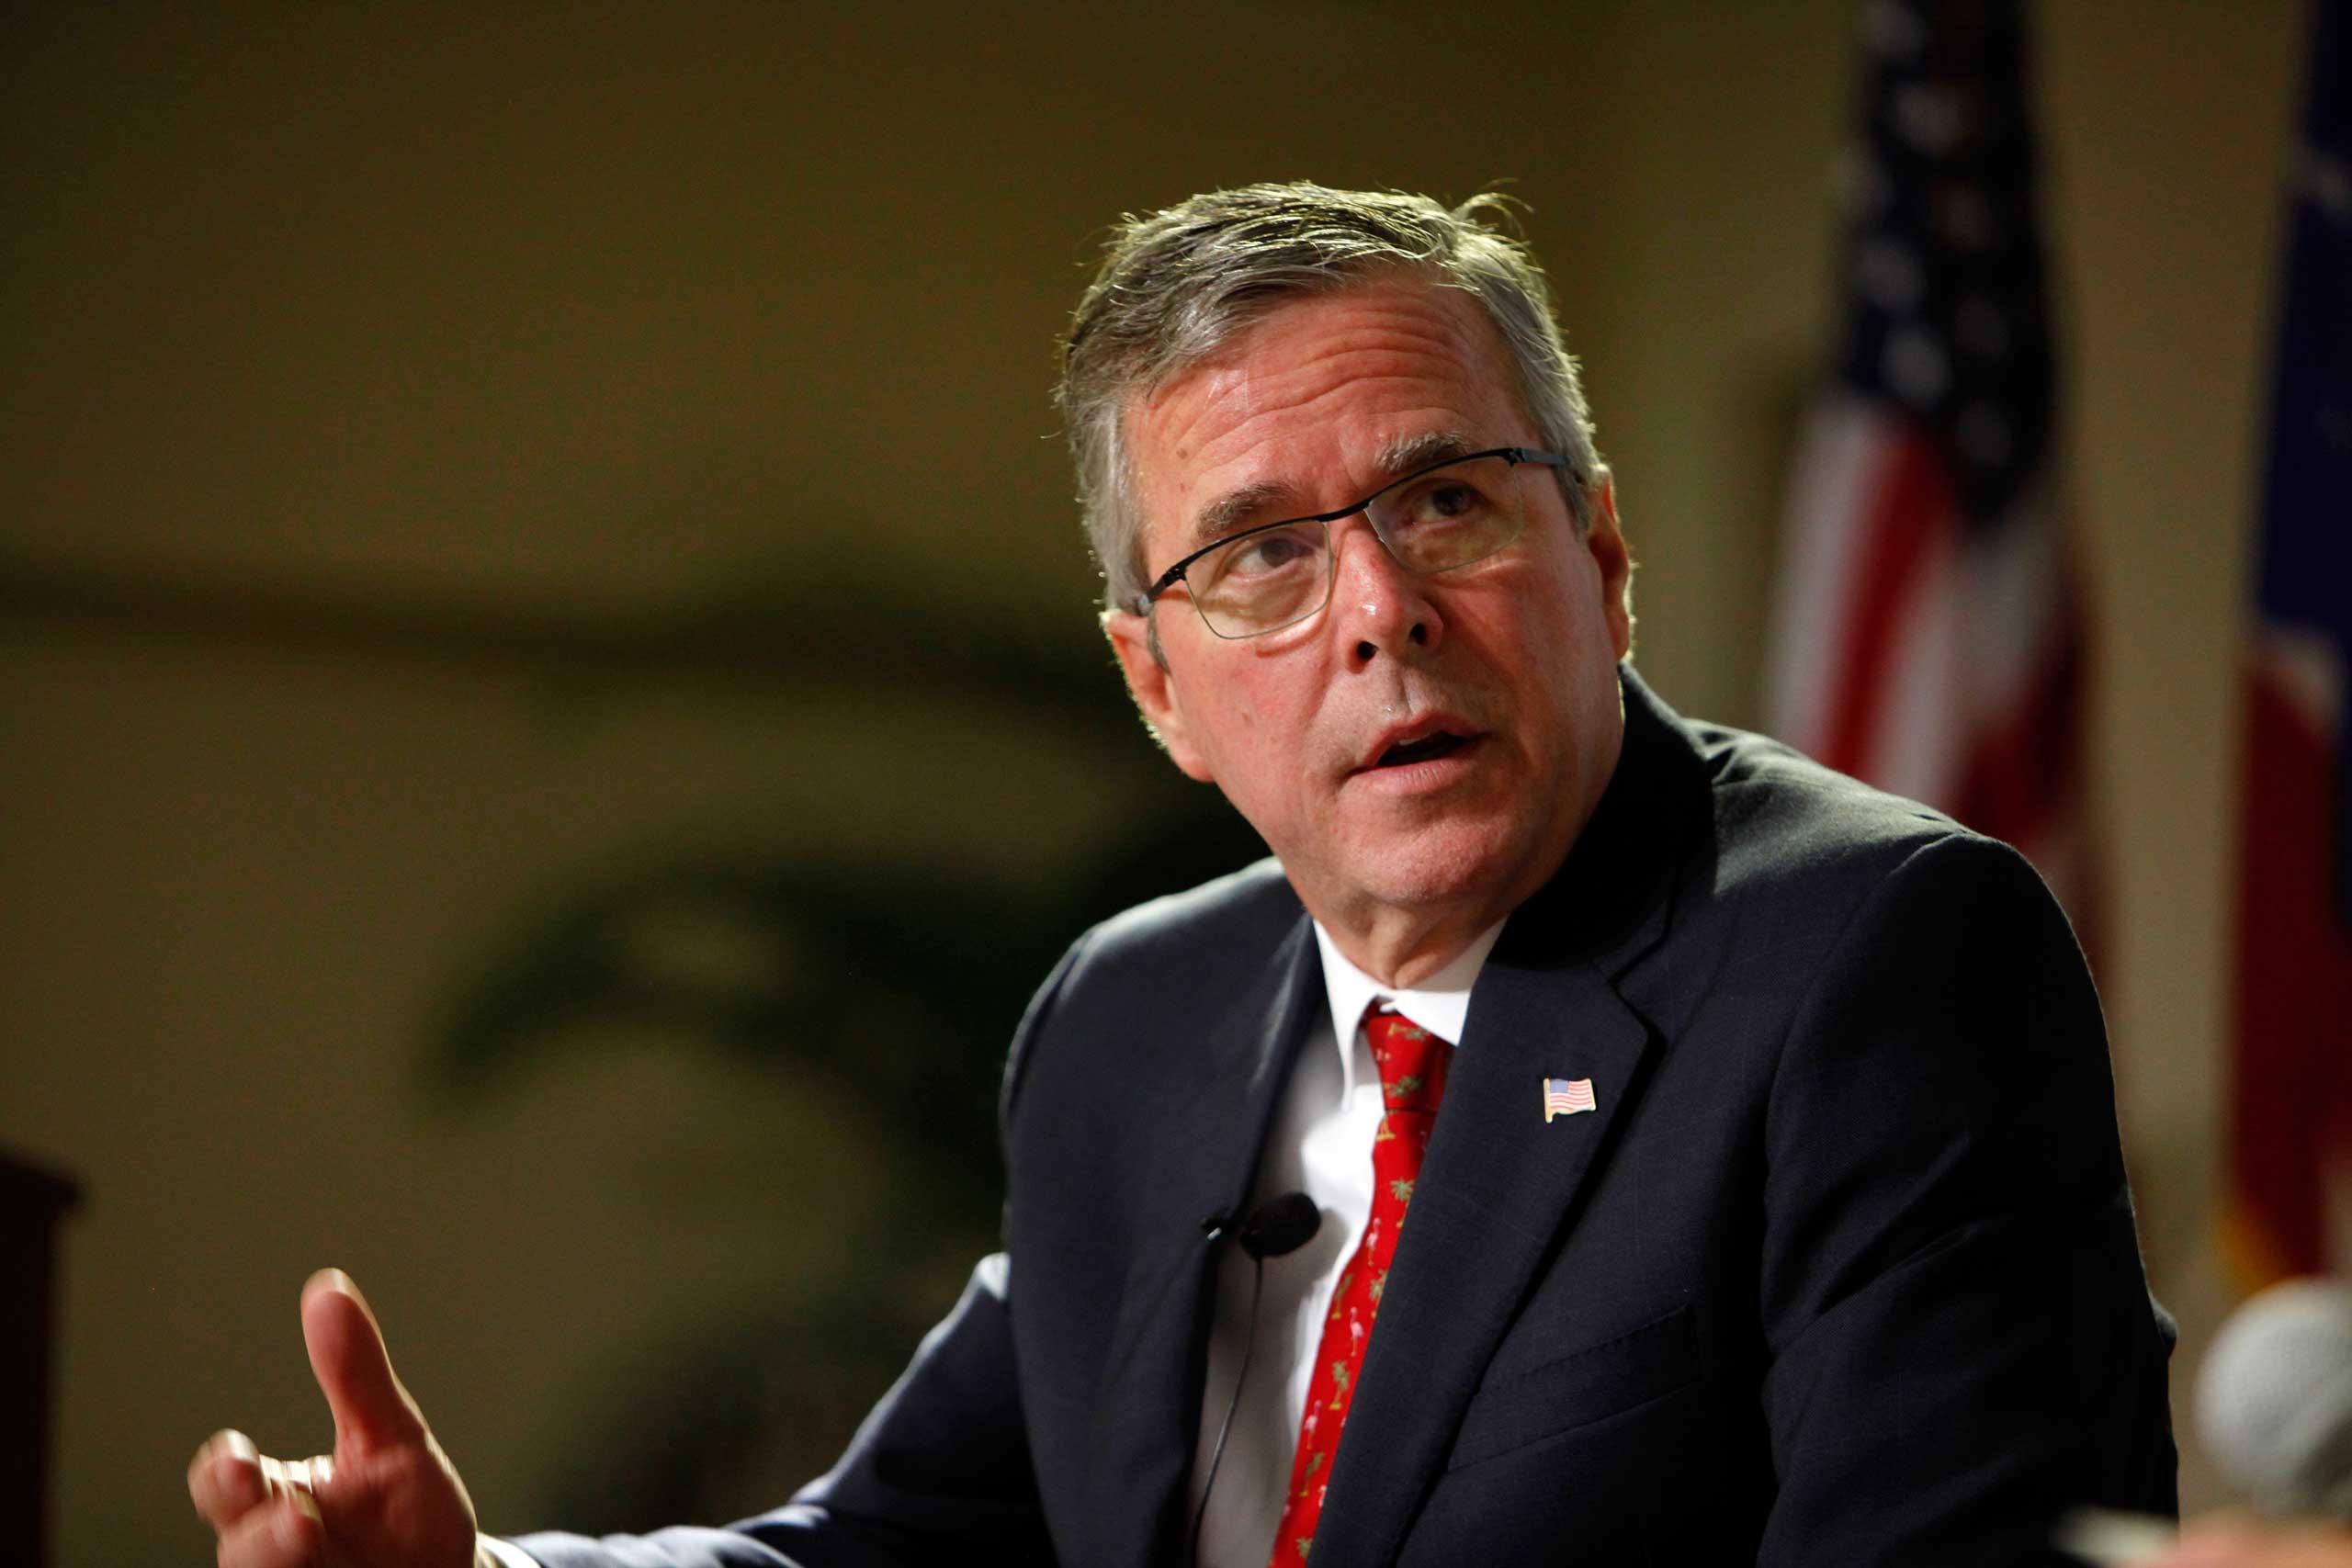 Former Florida Gov. Jeb Bush speaks during an event at the Metropolitan University in San Juan, Puerto Rico on April 28, 2015.